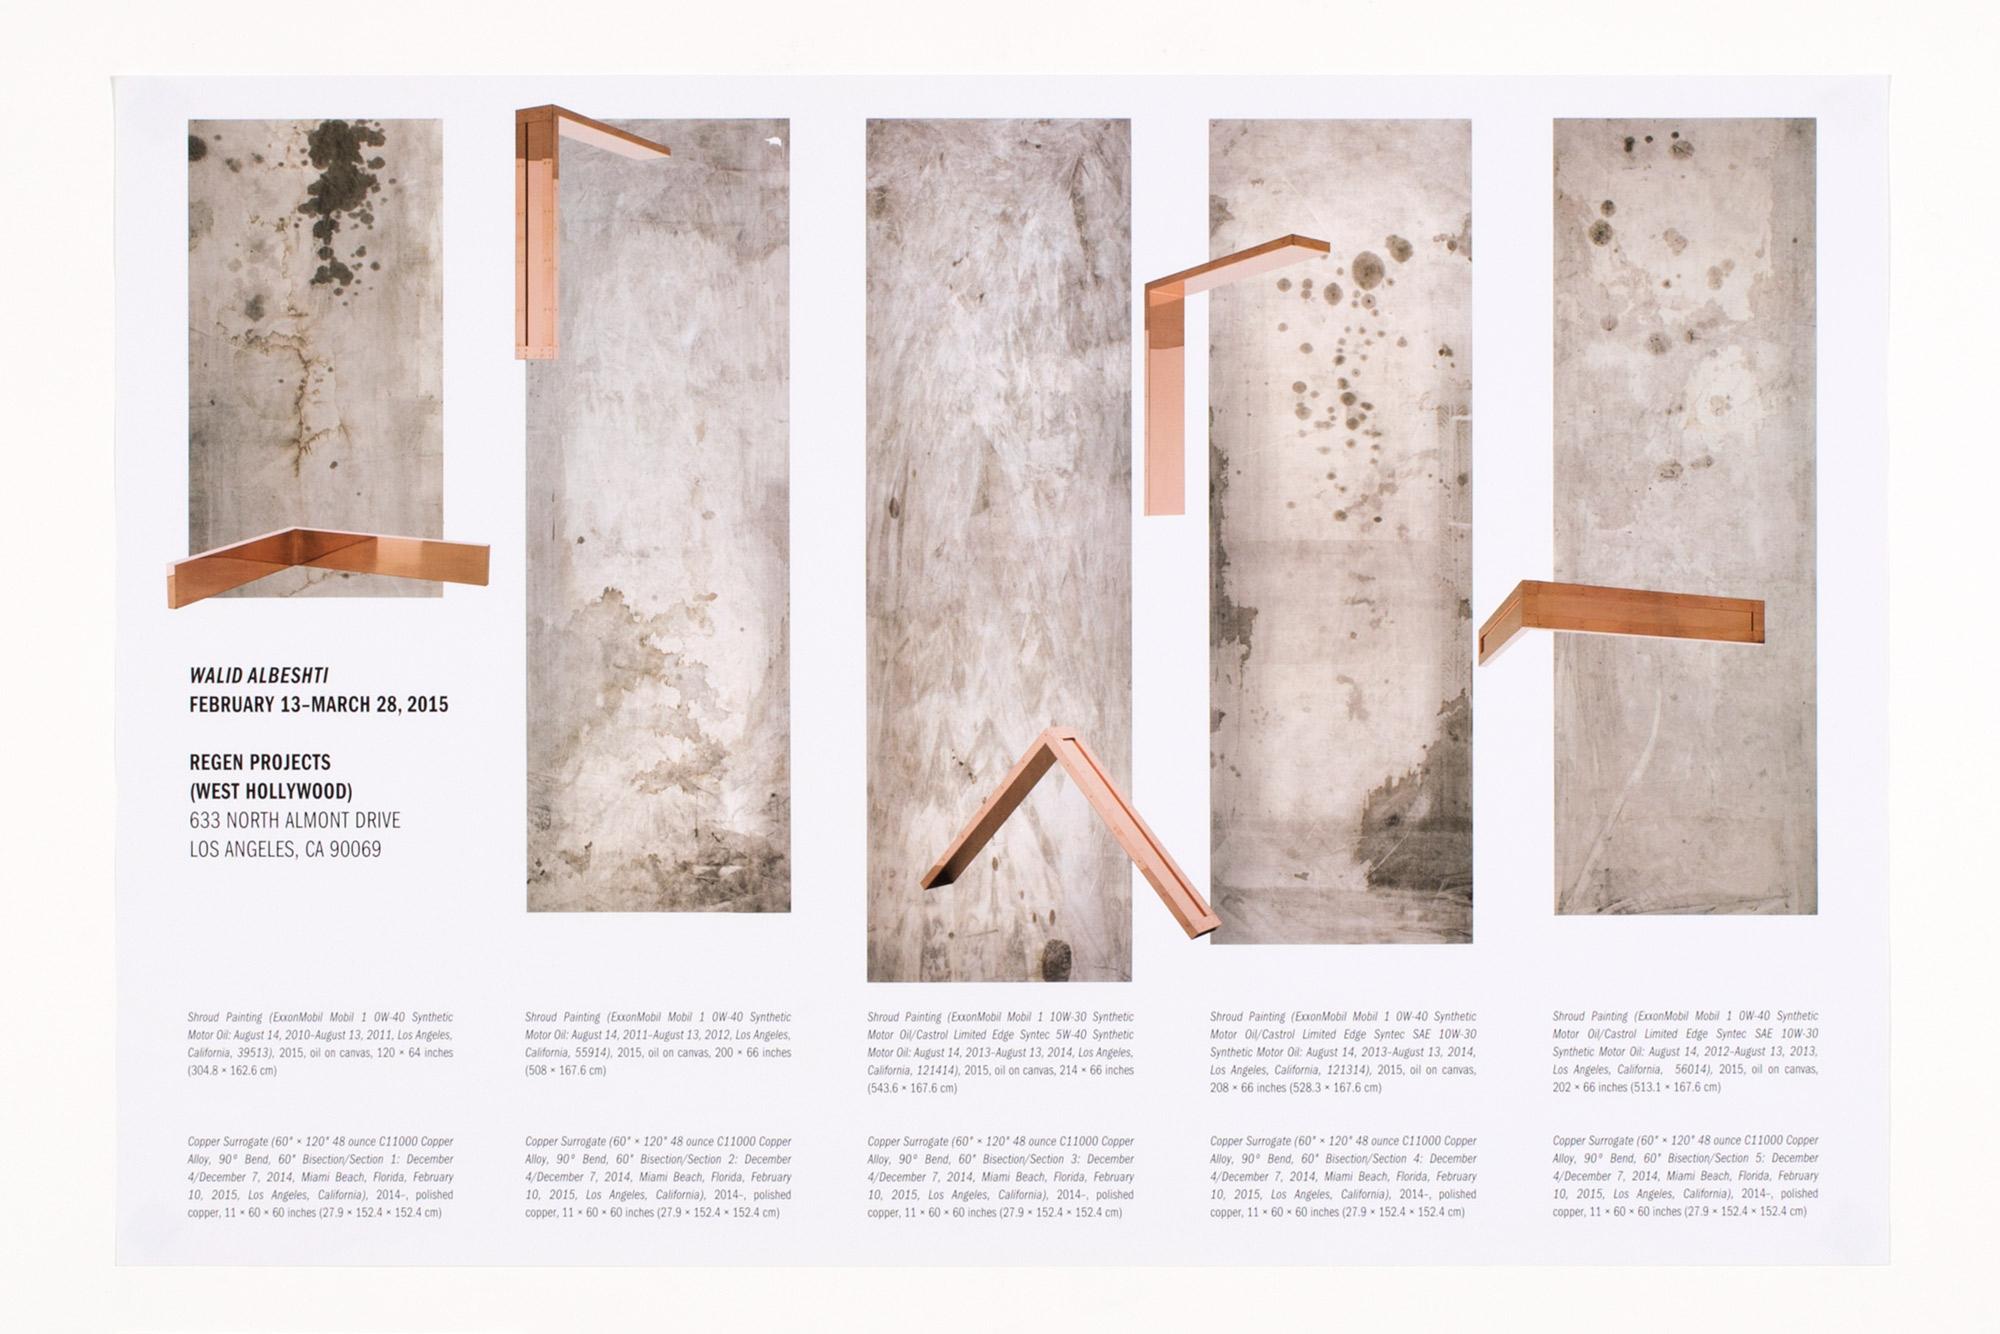 Walid AlBeshti poster   Regen Projects  Los Angeles  California  2015